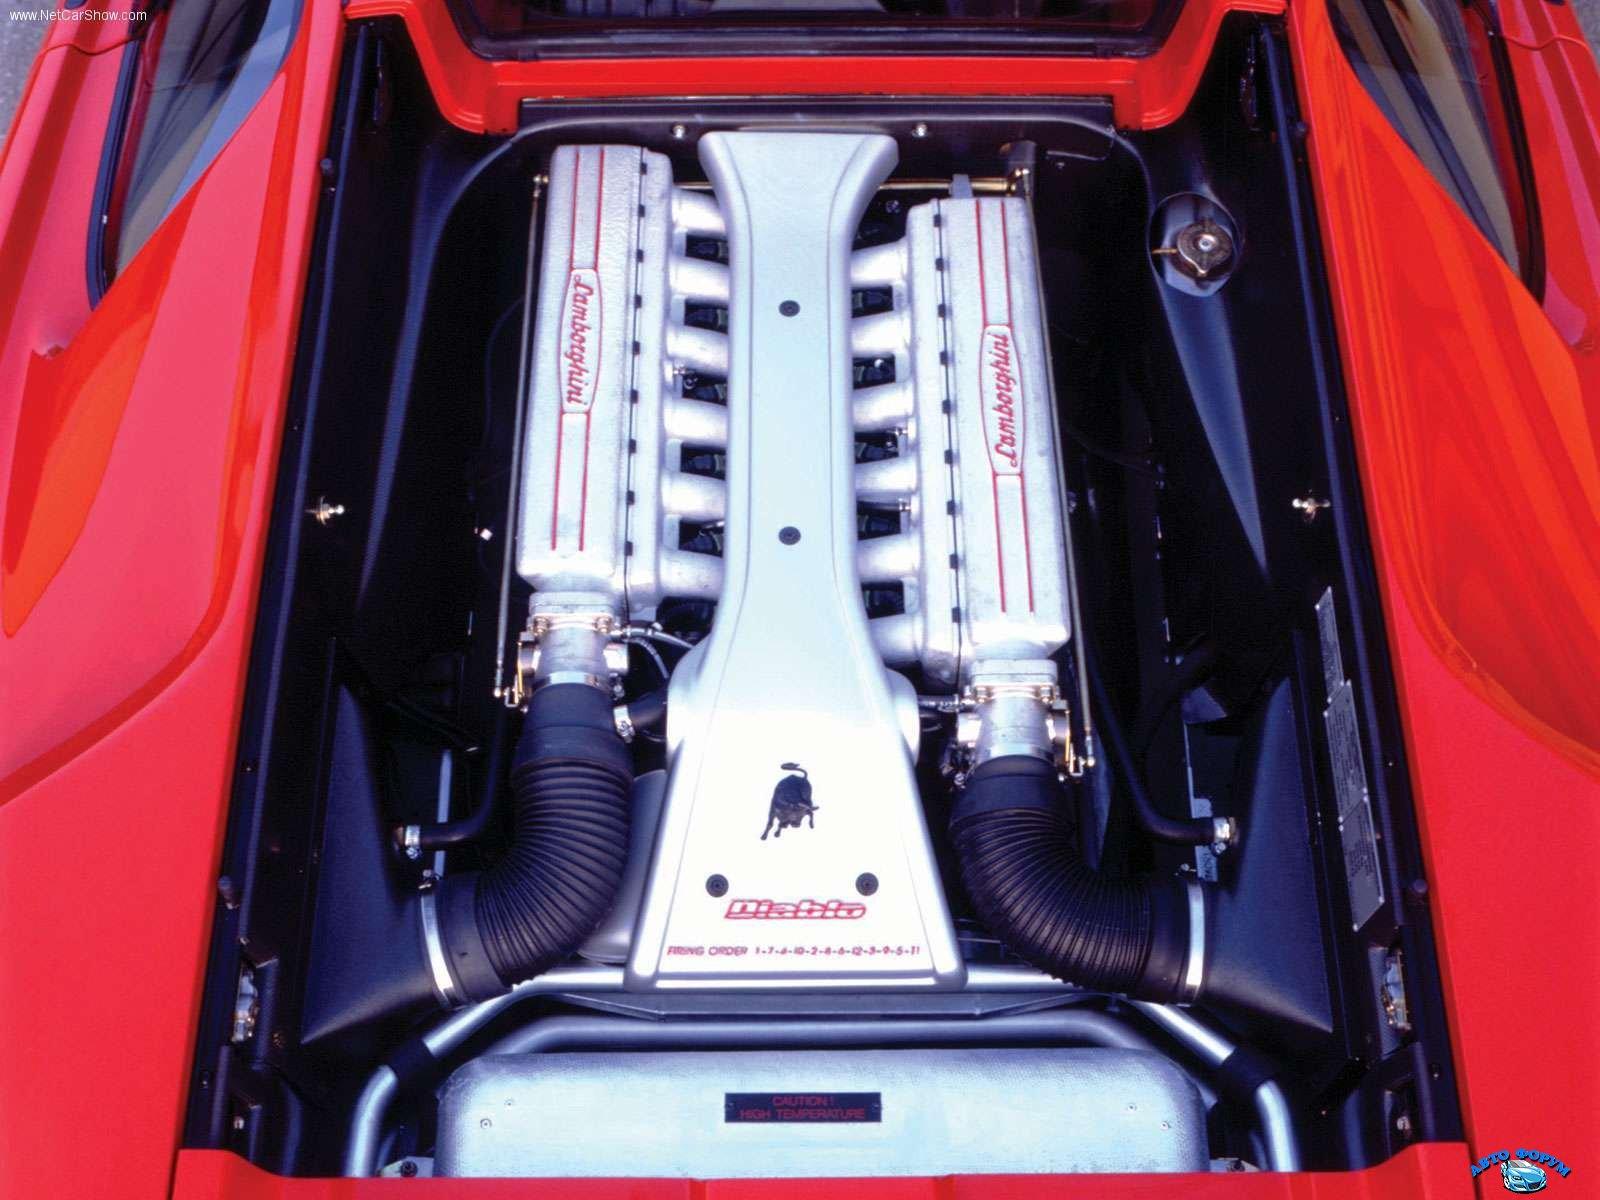 Lamborghini-Diablo_VT_1993_1600x1200_wallpaper_09.jpg